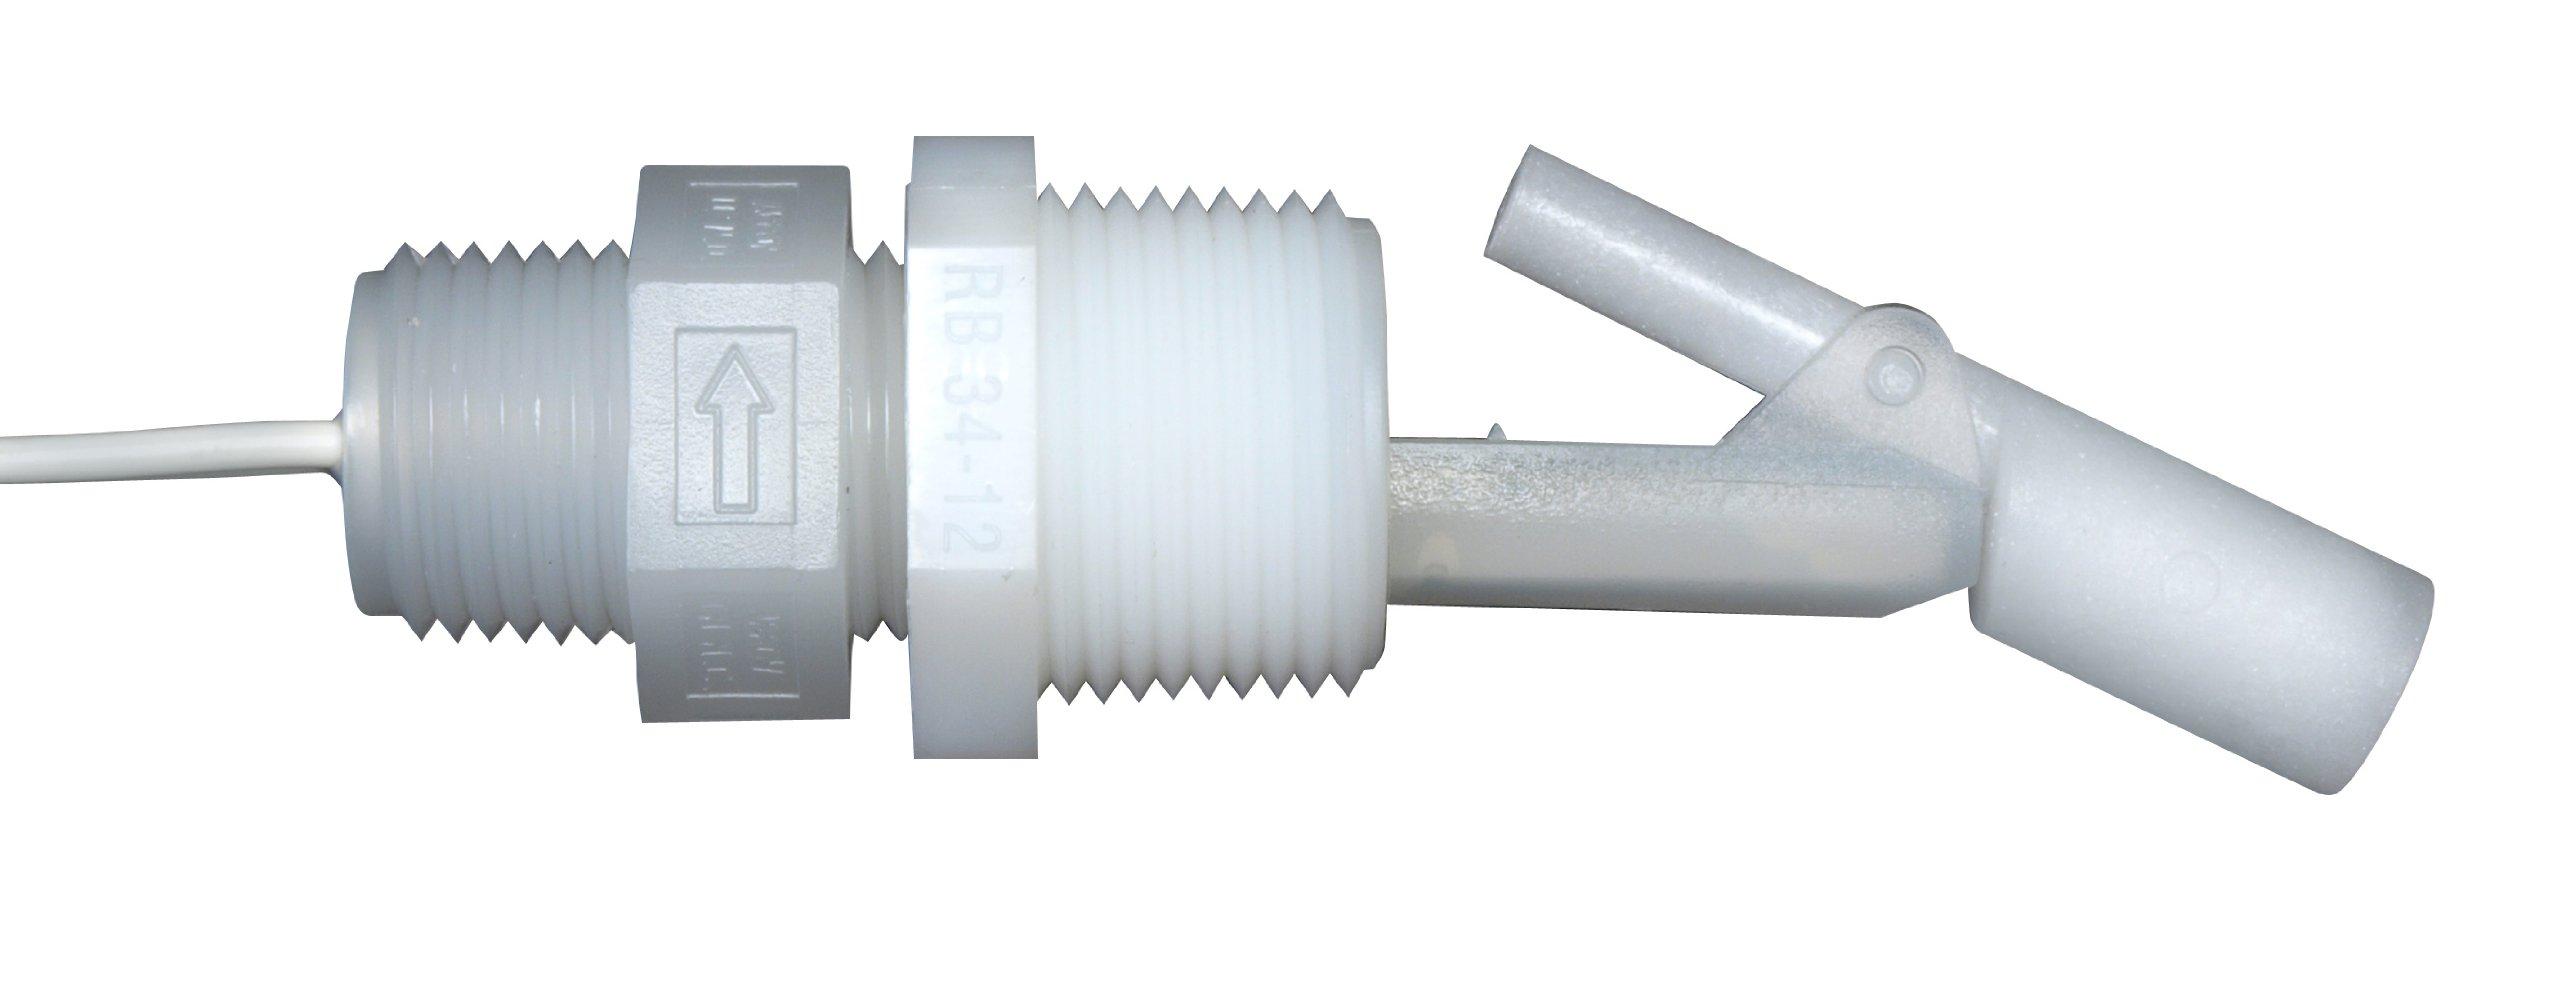 Madison M8700-C Polypropylene HVAC Series Condensate Level Float Switch, 30 VA SPST, 1/2 x 3/4 NPT Male, 100 psig Pressure